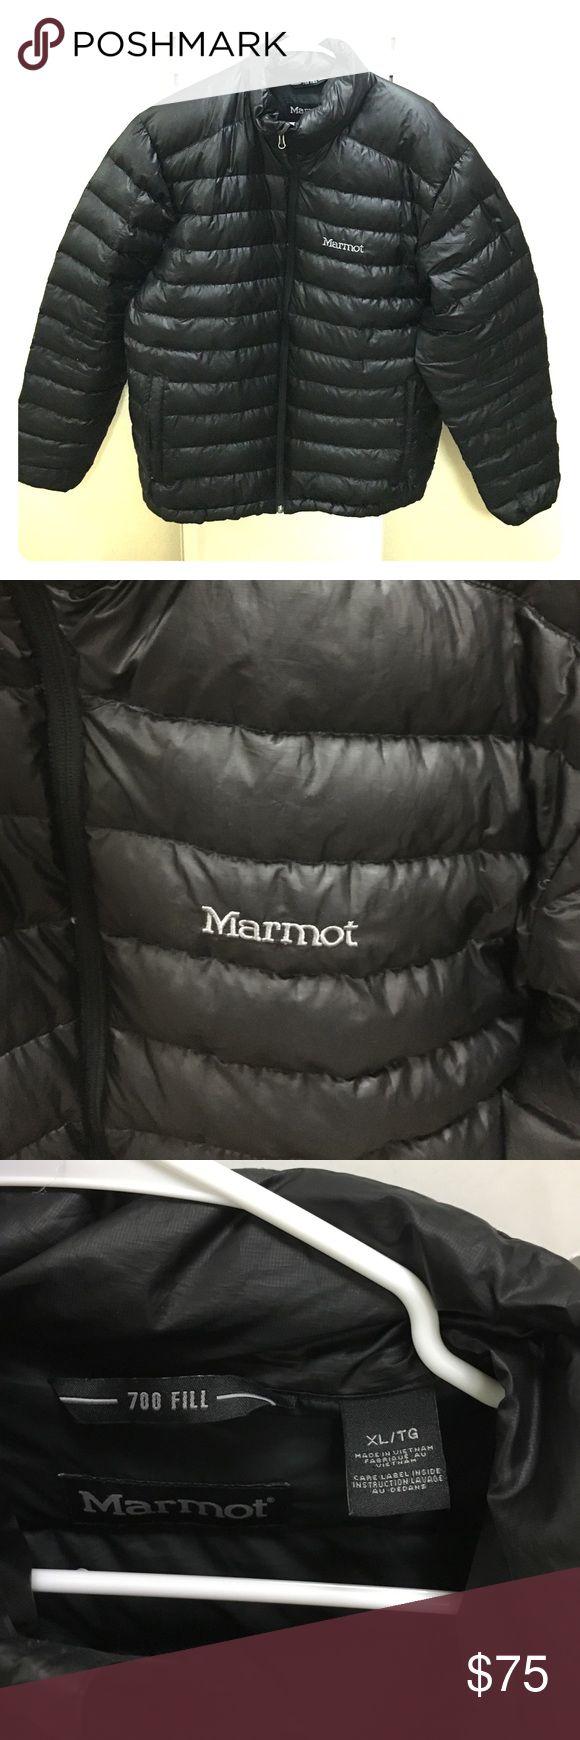 Men's size XL new Marmot puffer coat Men's size XL new Marmot puffer coat. Color black. Worn once Marmot Jackets & Coats Puffers